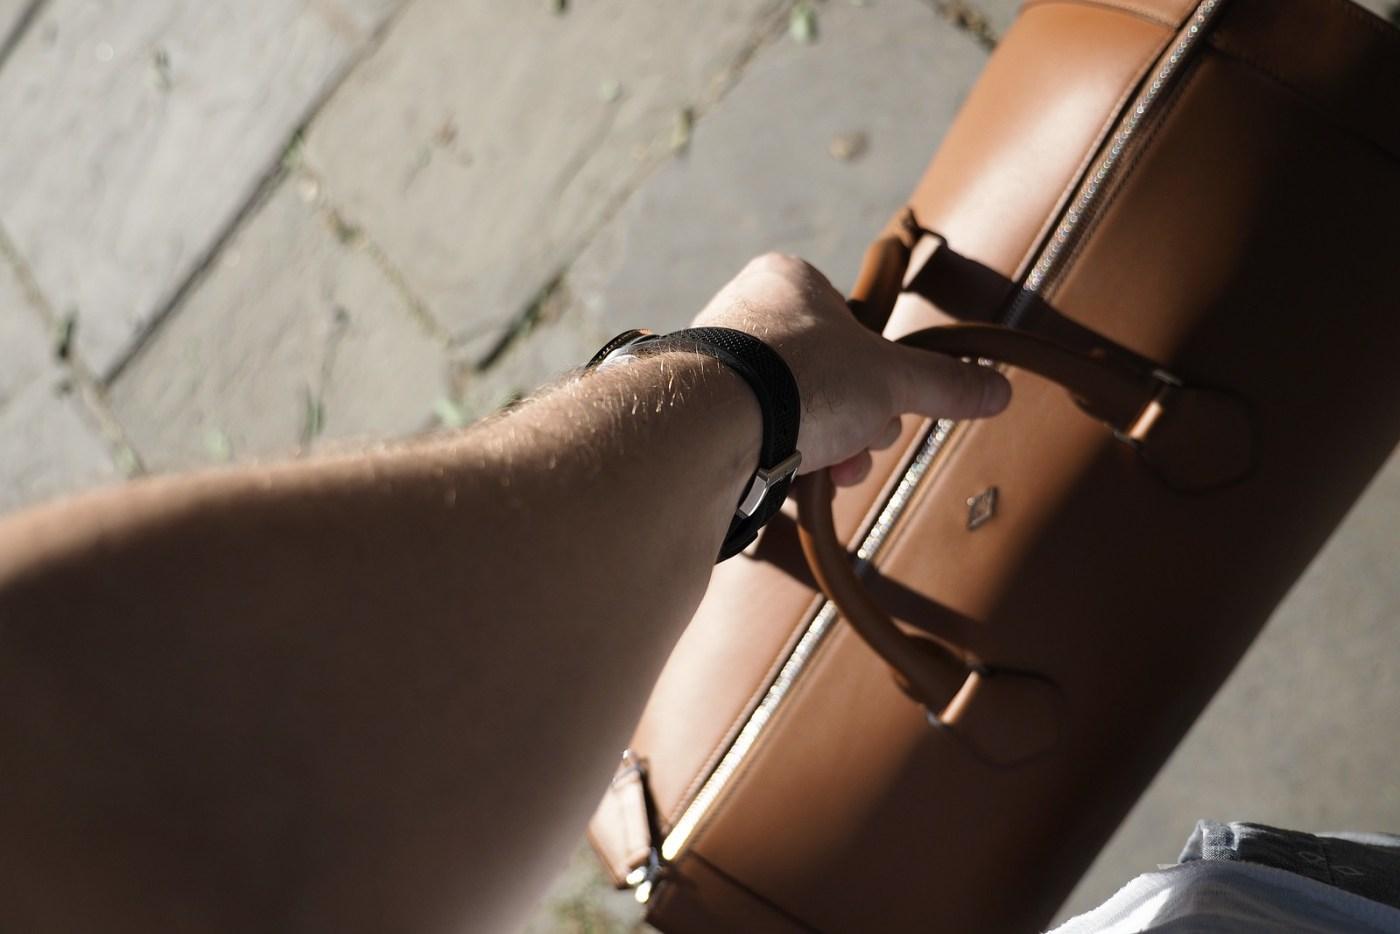 Cartier Two-Tone Diver's Watch wristshot holding Louis Cartier 24 Hour leather bag